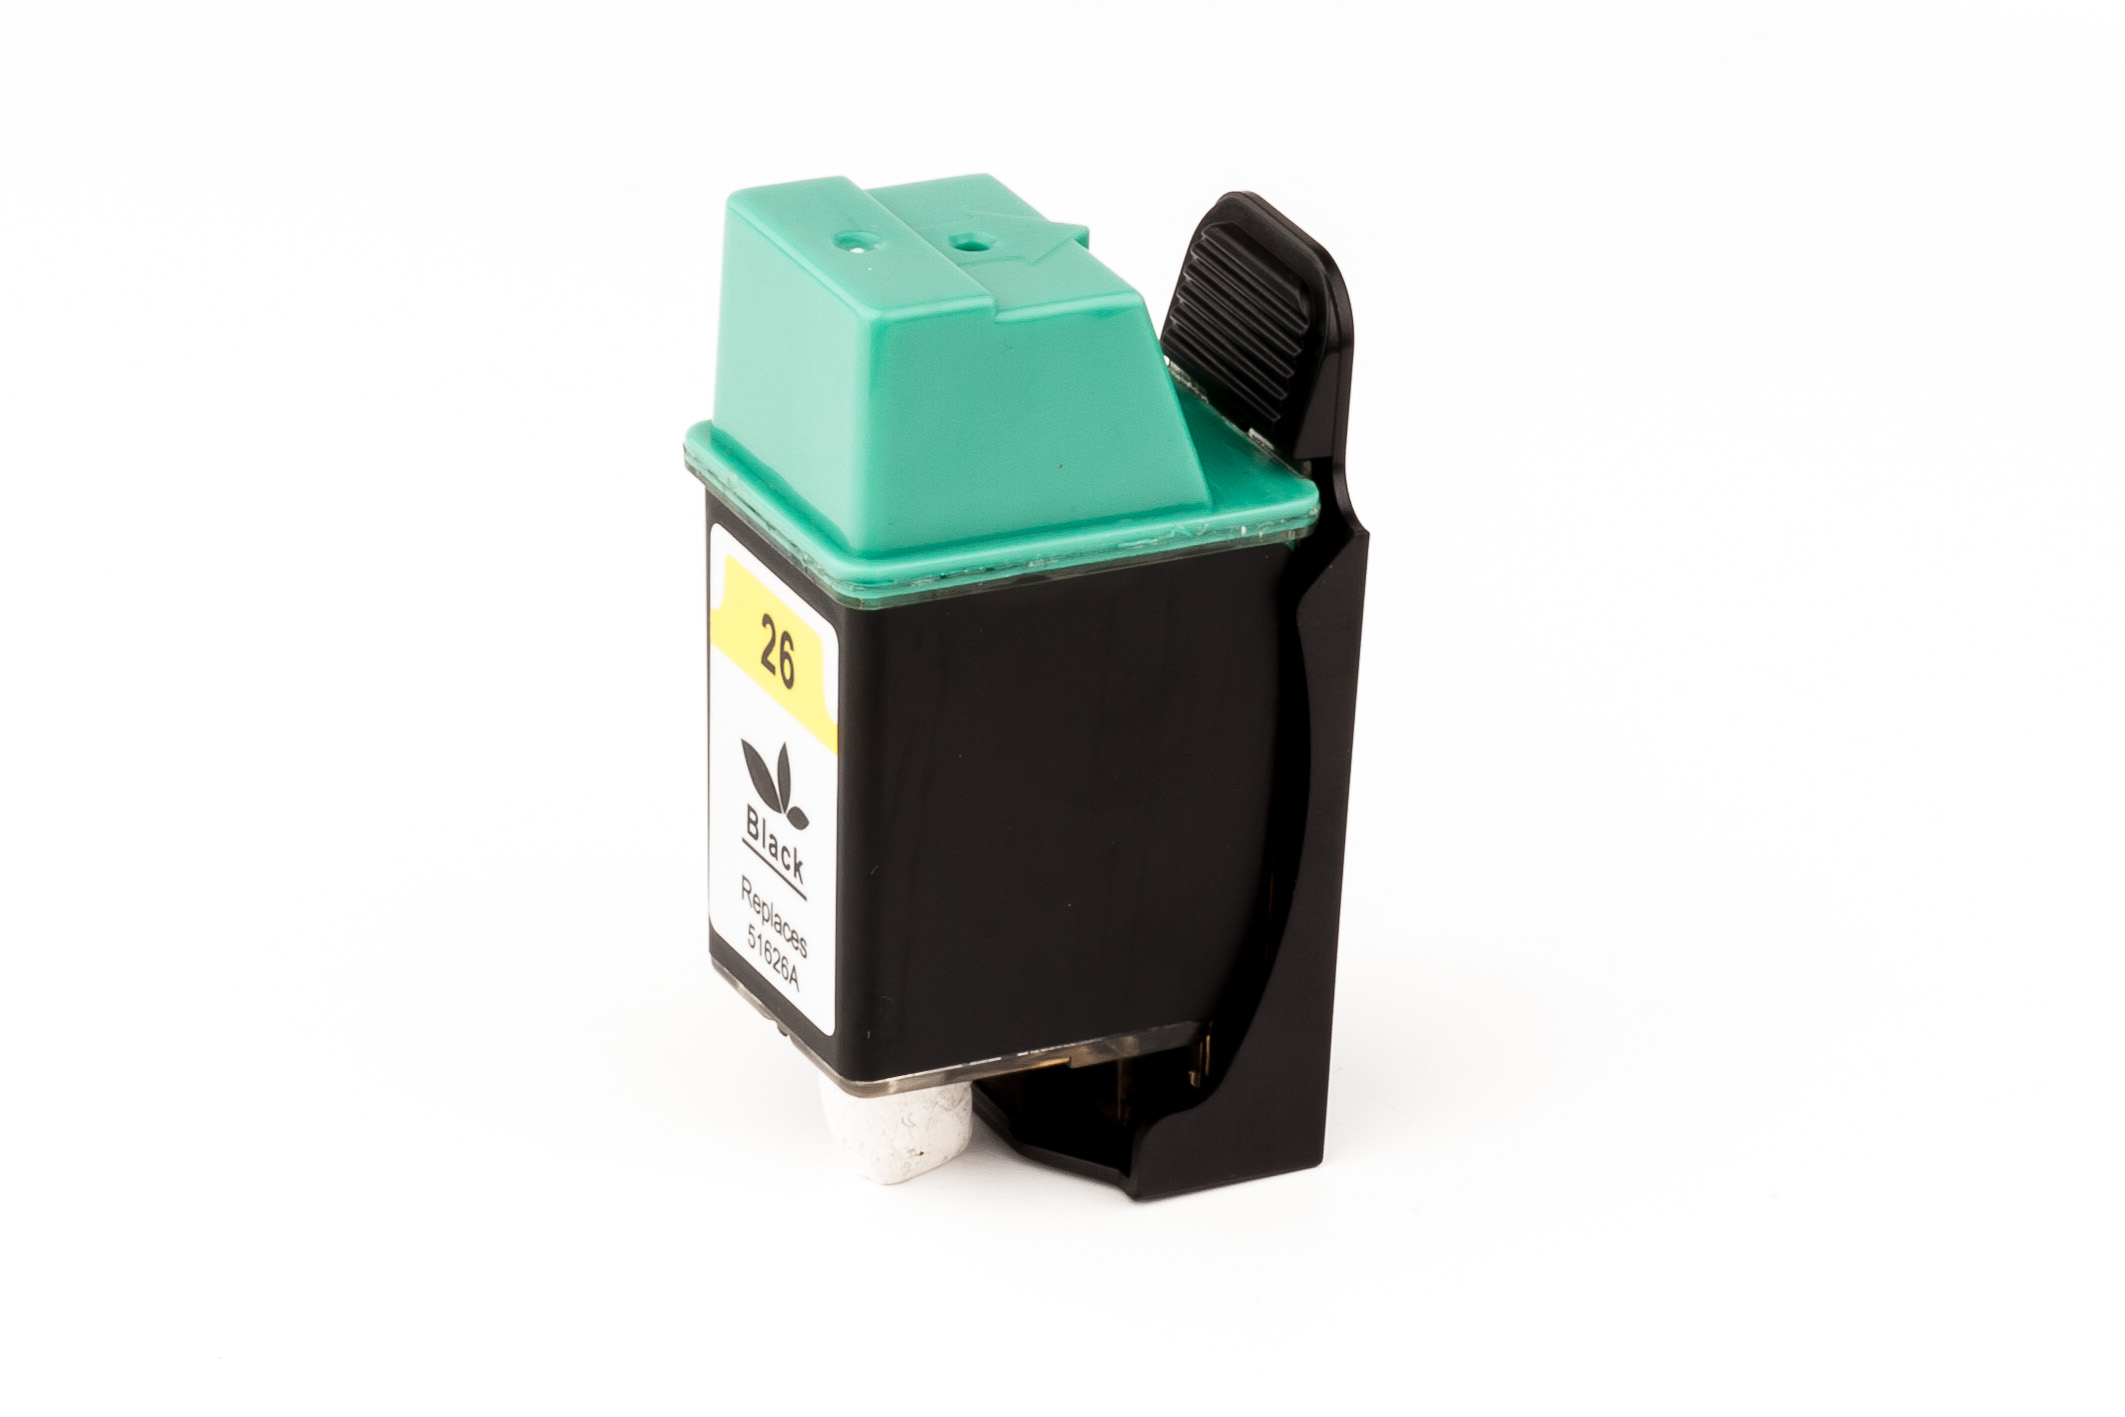 ASC-Premium-Druckkopf für Olympia Olyfax 450 schwarz Olyfax 450 Olyfax450